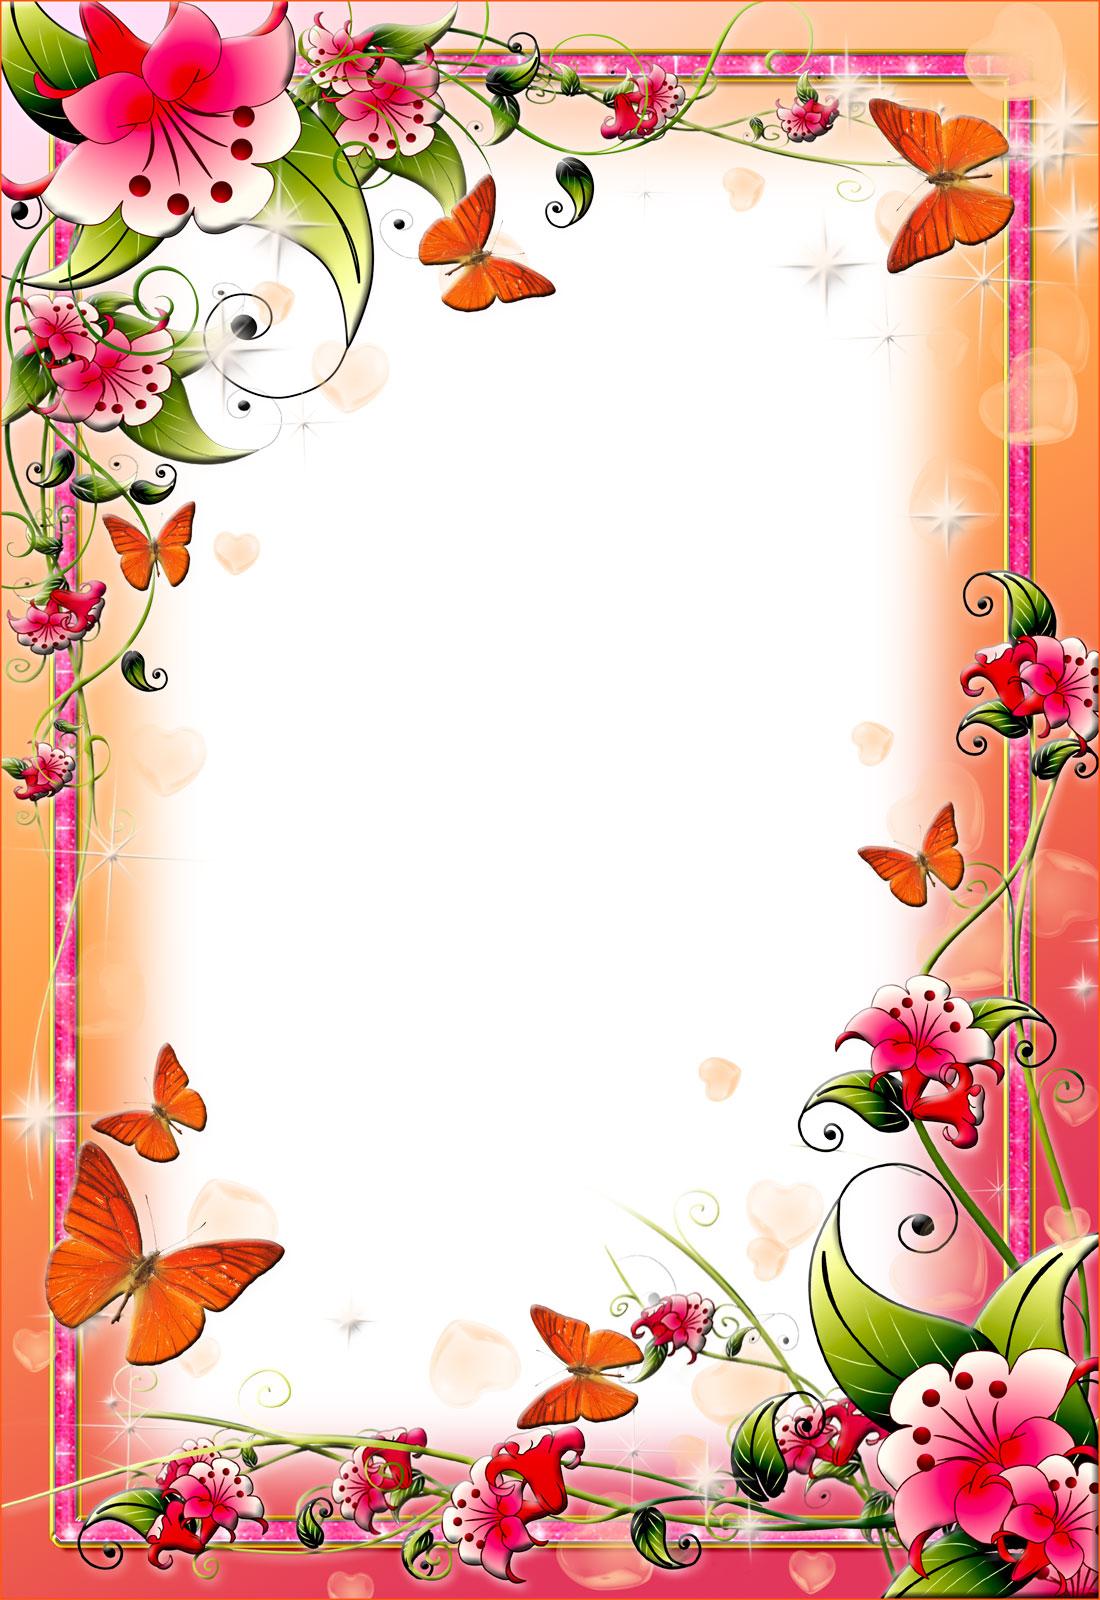 46 Flower Borders Wallpaper On Wallpapersafari